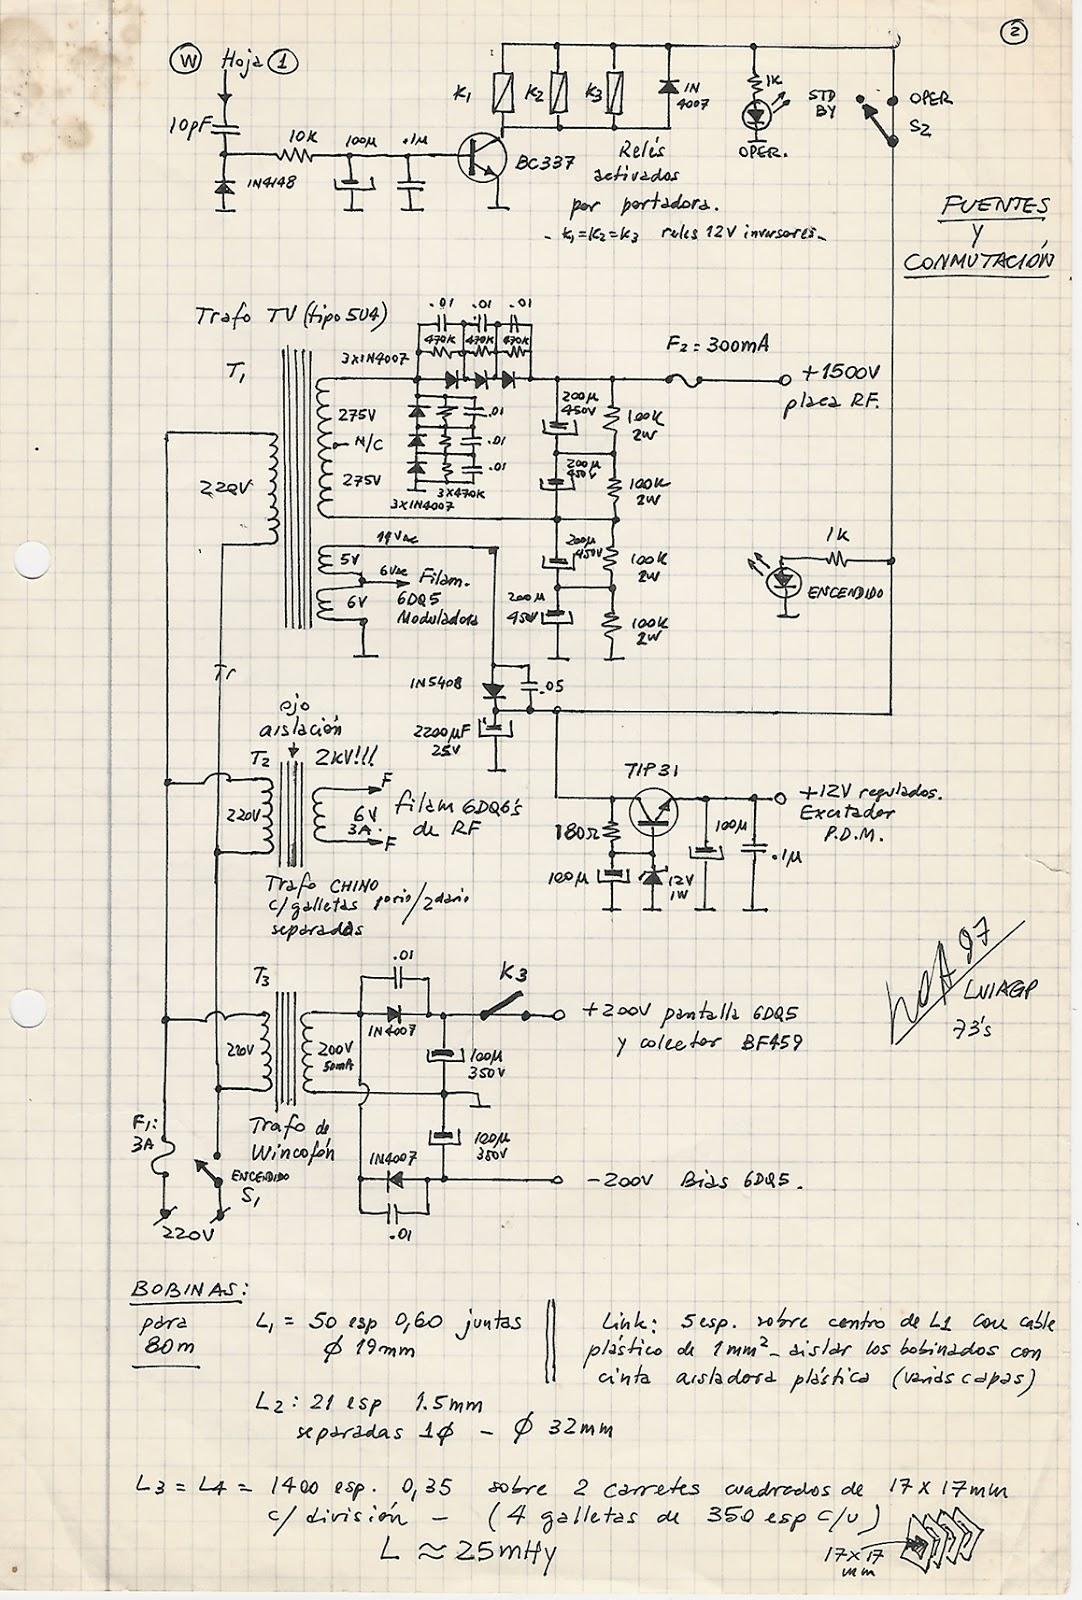 Circuito Wincofon : Transmisor am pwm a valvulas tube